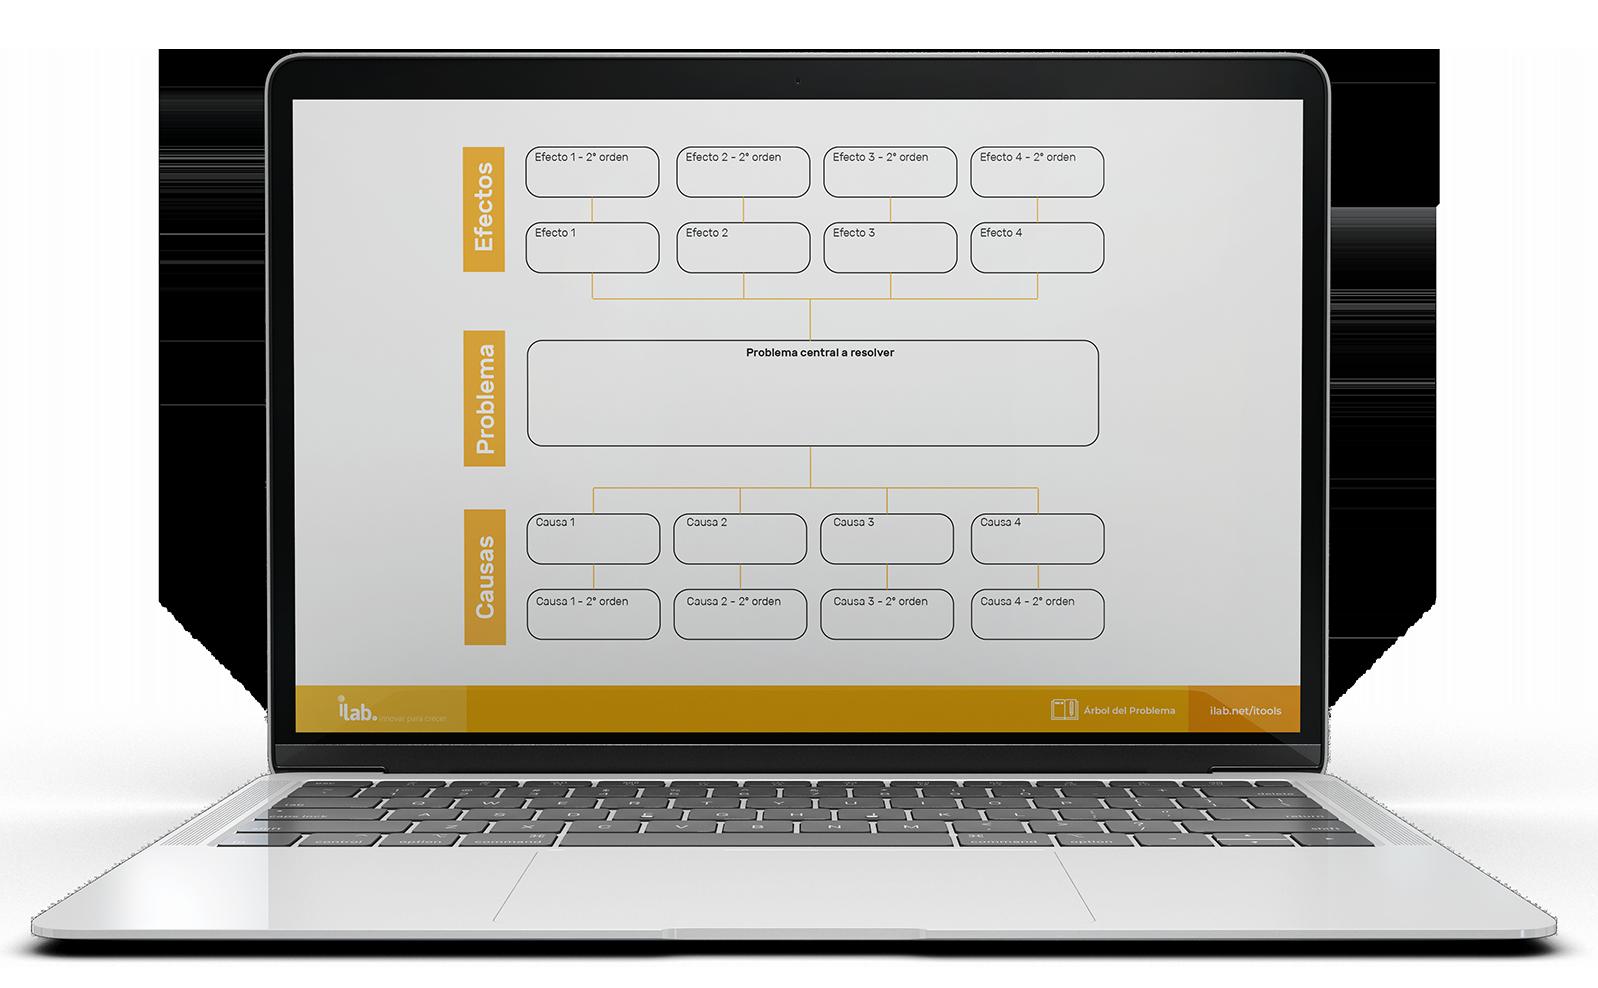 herraminetas innovacion business model canvas